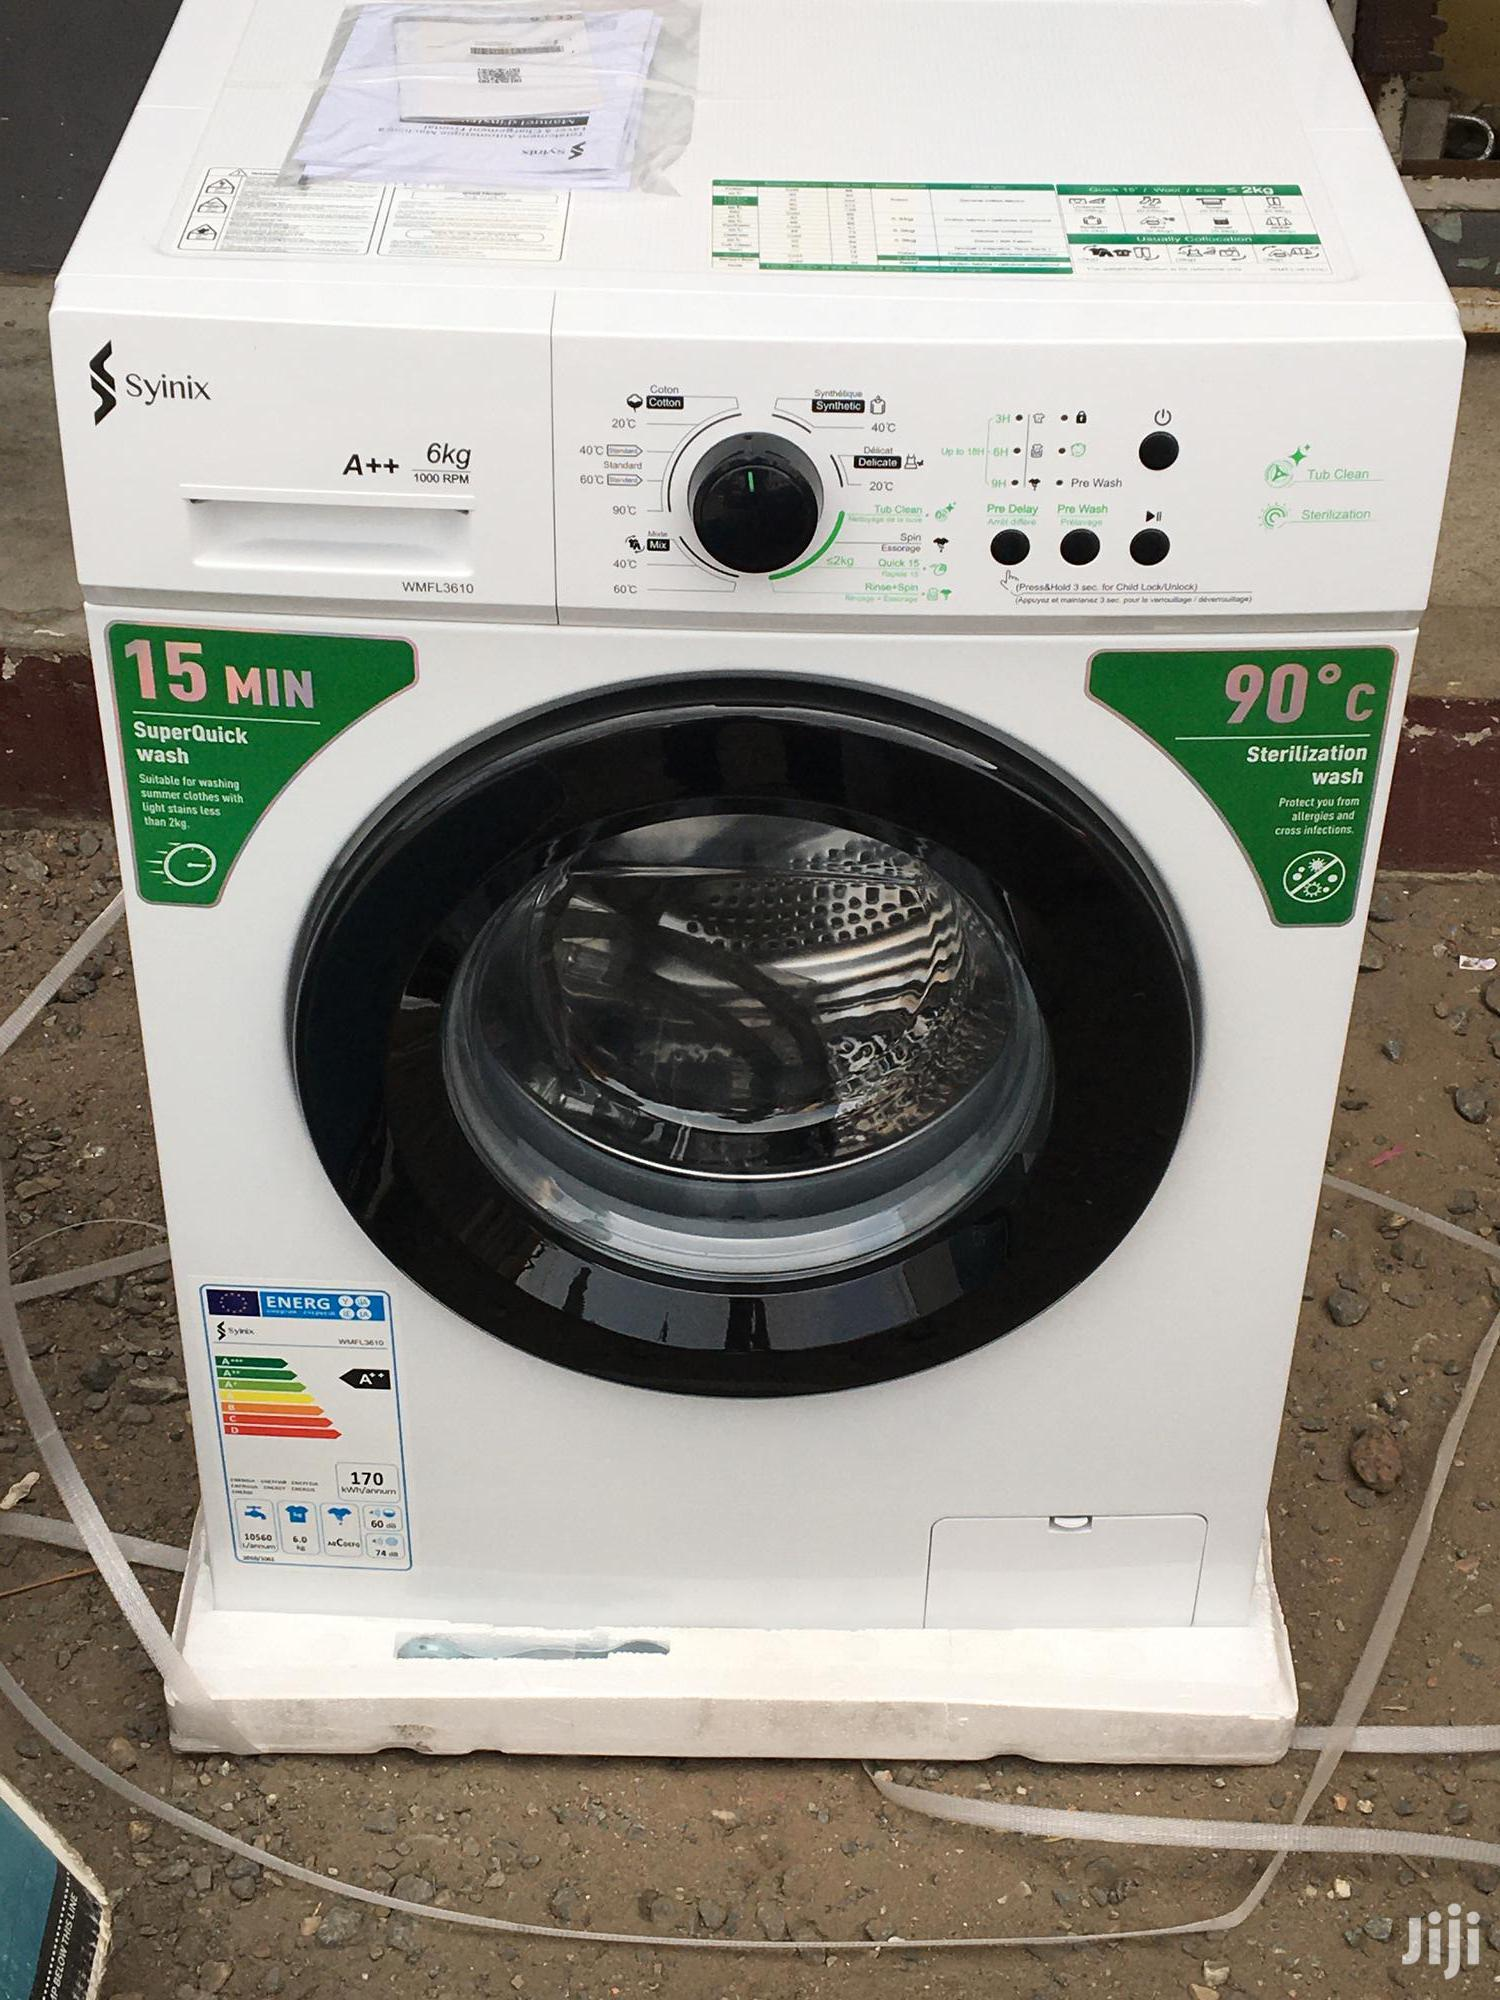 Brand New Syinix 6kg Full Automatic Washing Machine